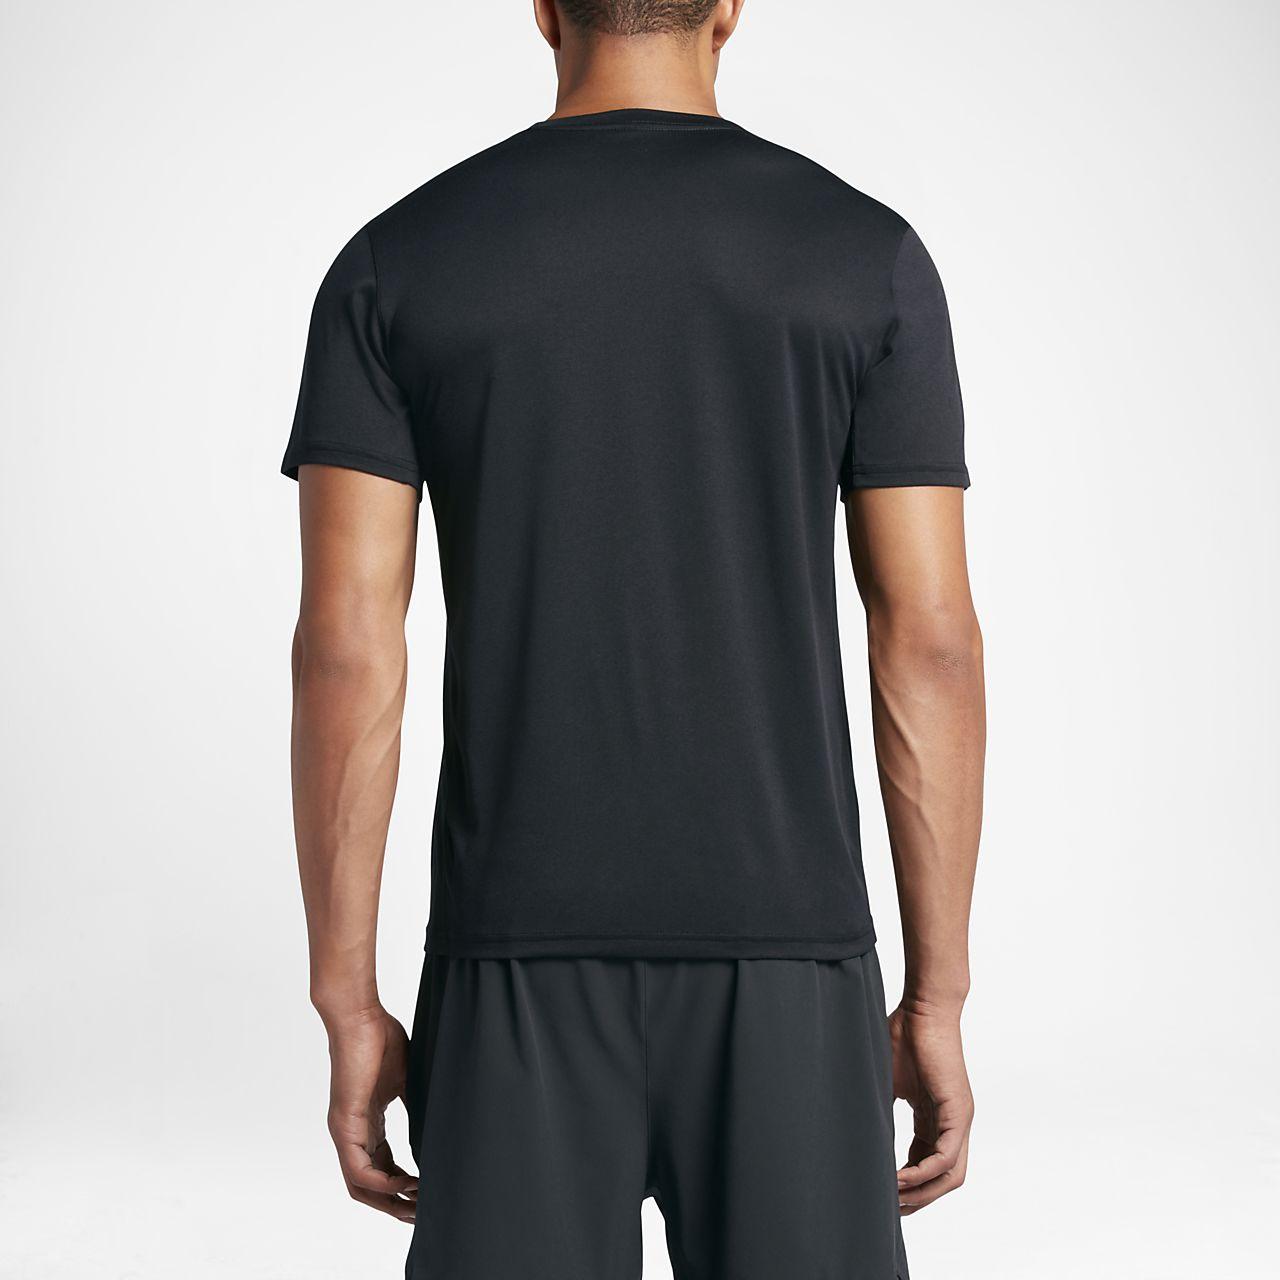 Nike Legend 2.0 Men's Training Shirts Black/Matte Silver